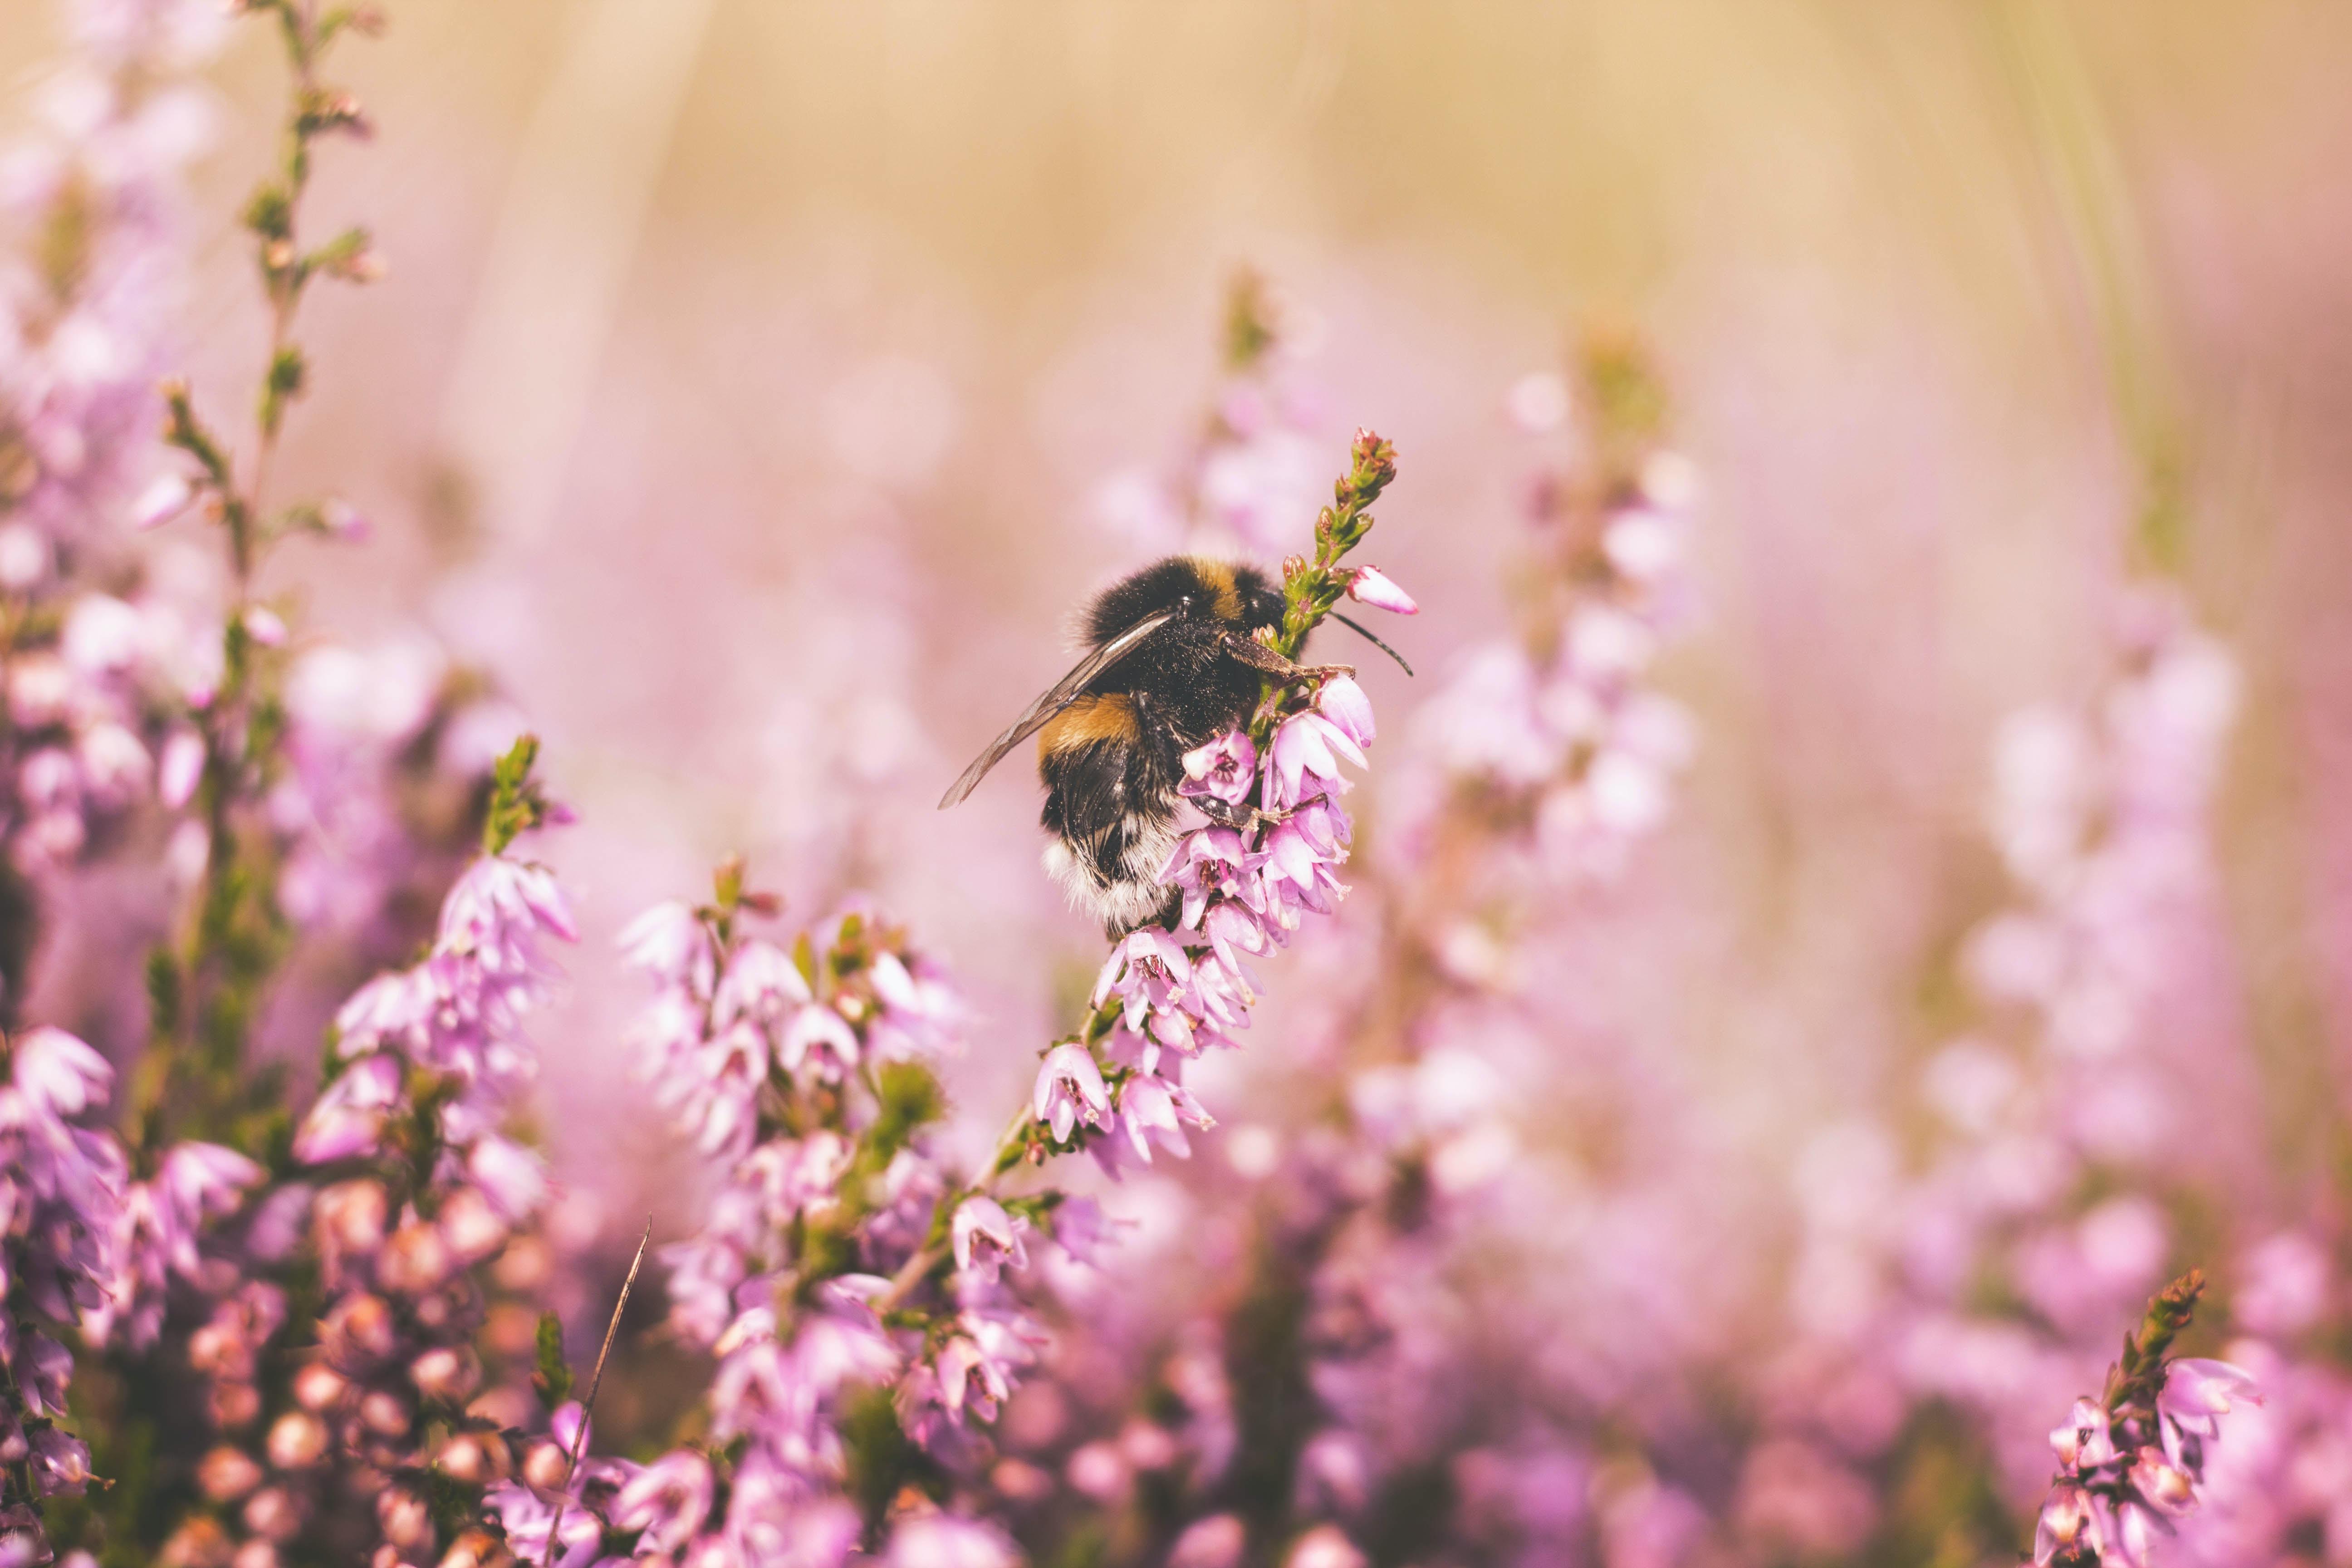 tilt shift lens photography of bee on top of pink flower